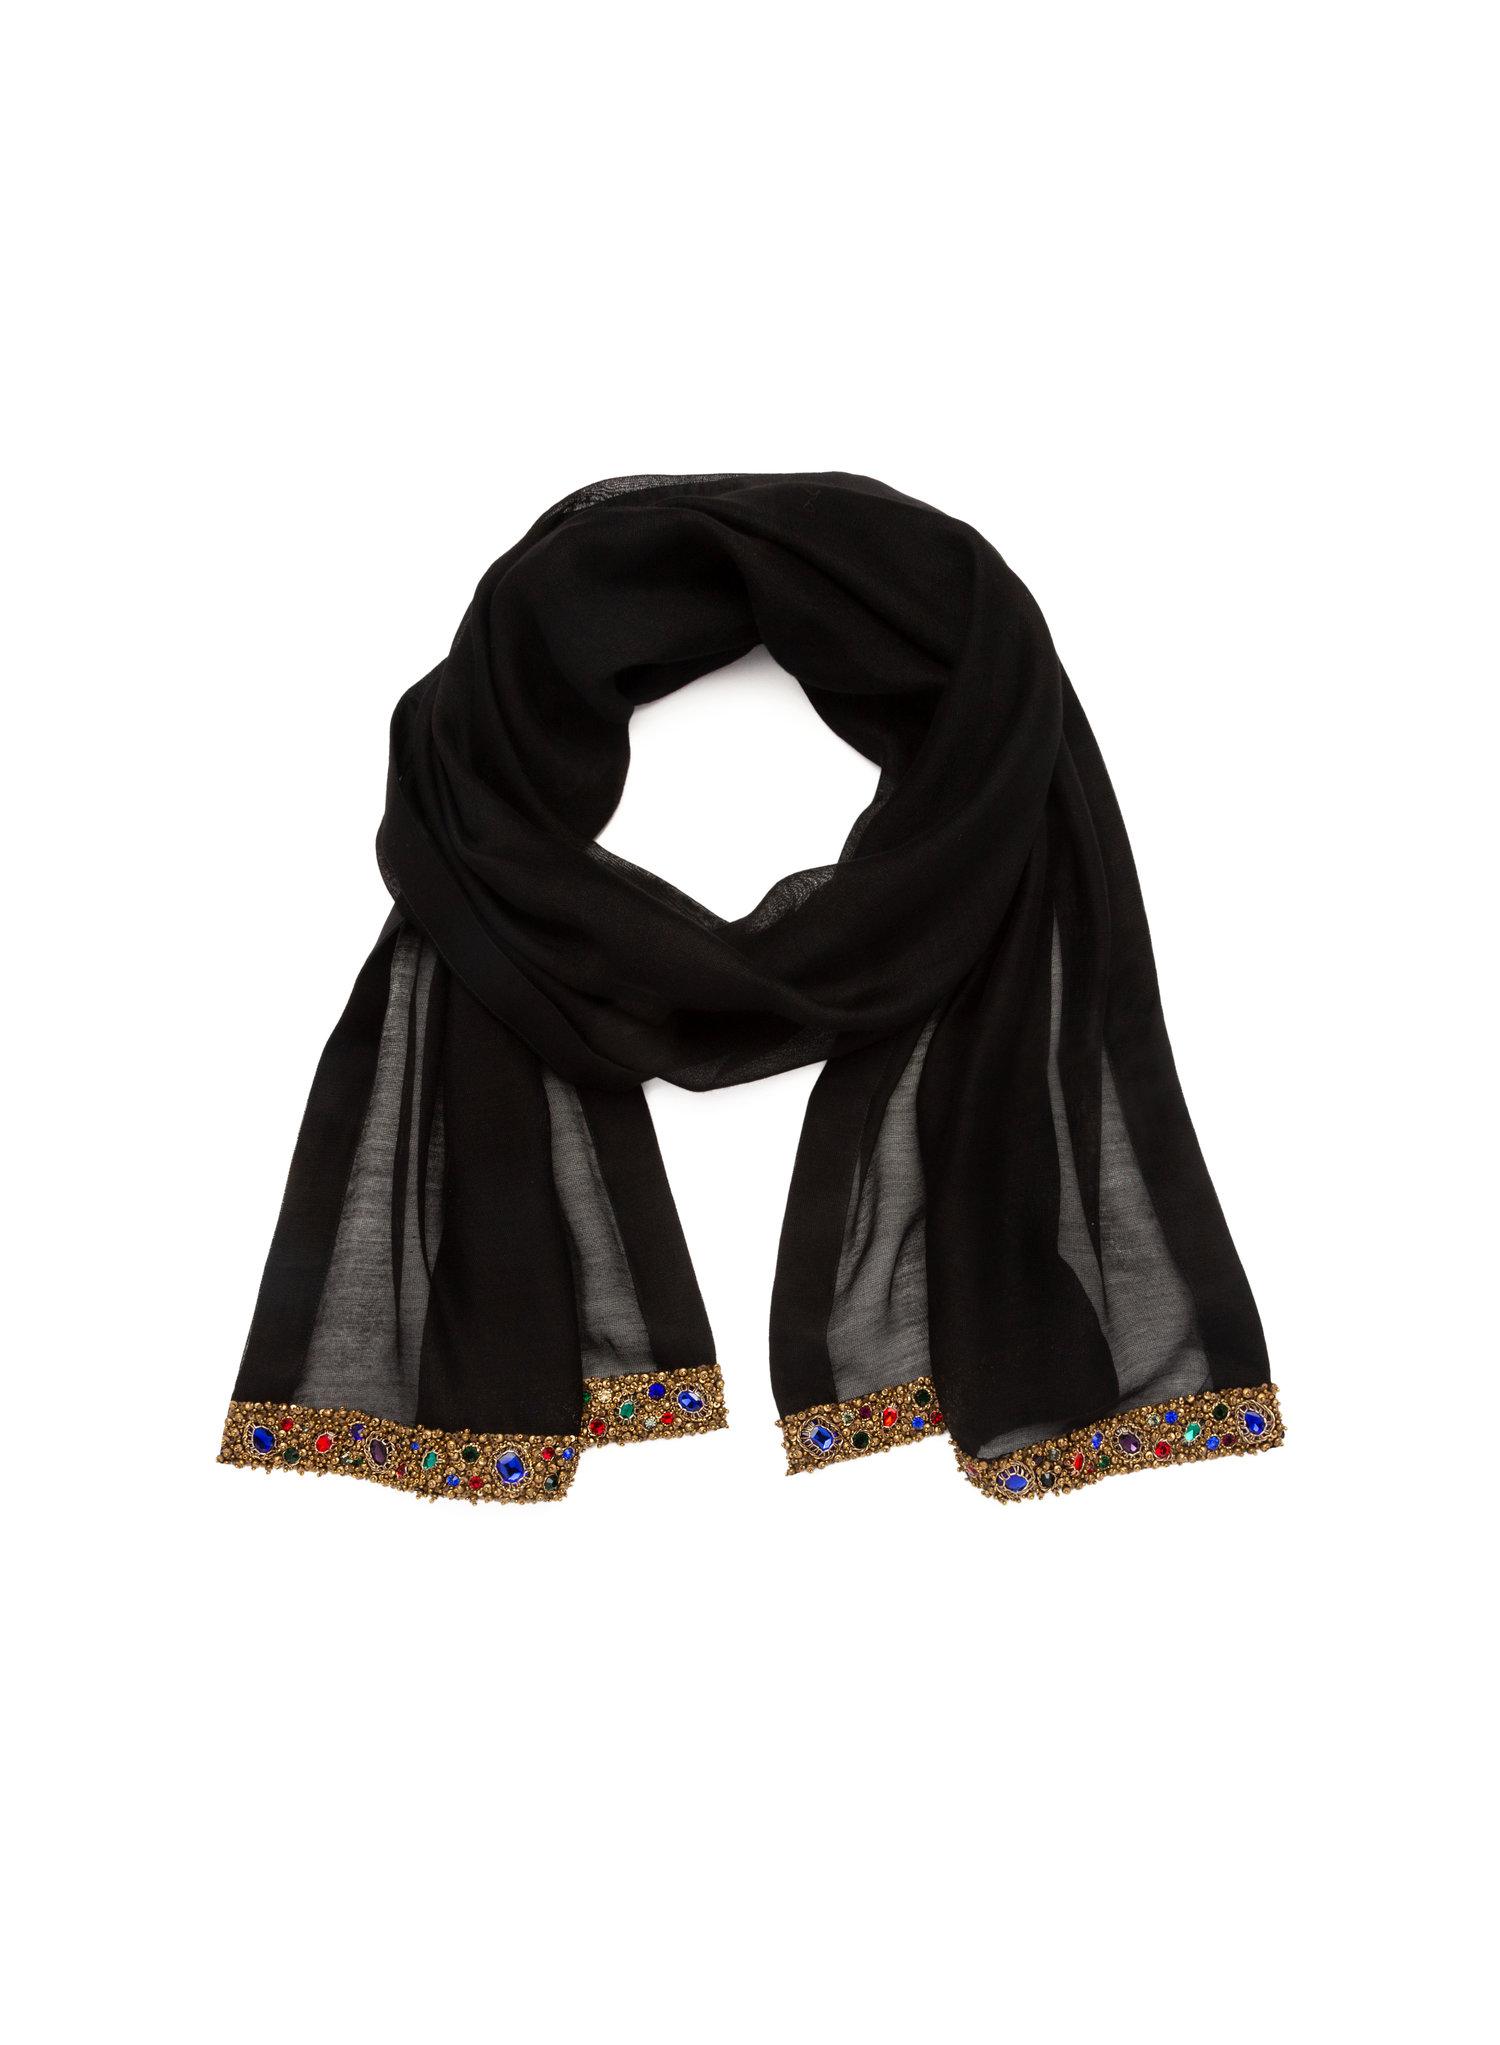 91b55685b91de Silk Oblong Multi Color Embellished — AZEEZA